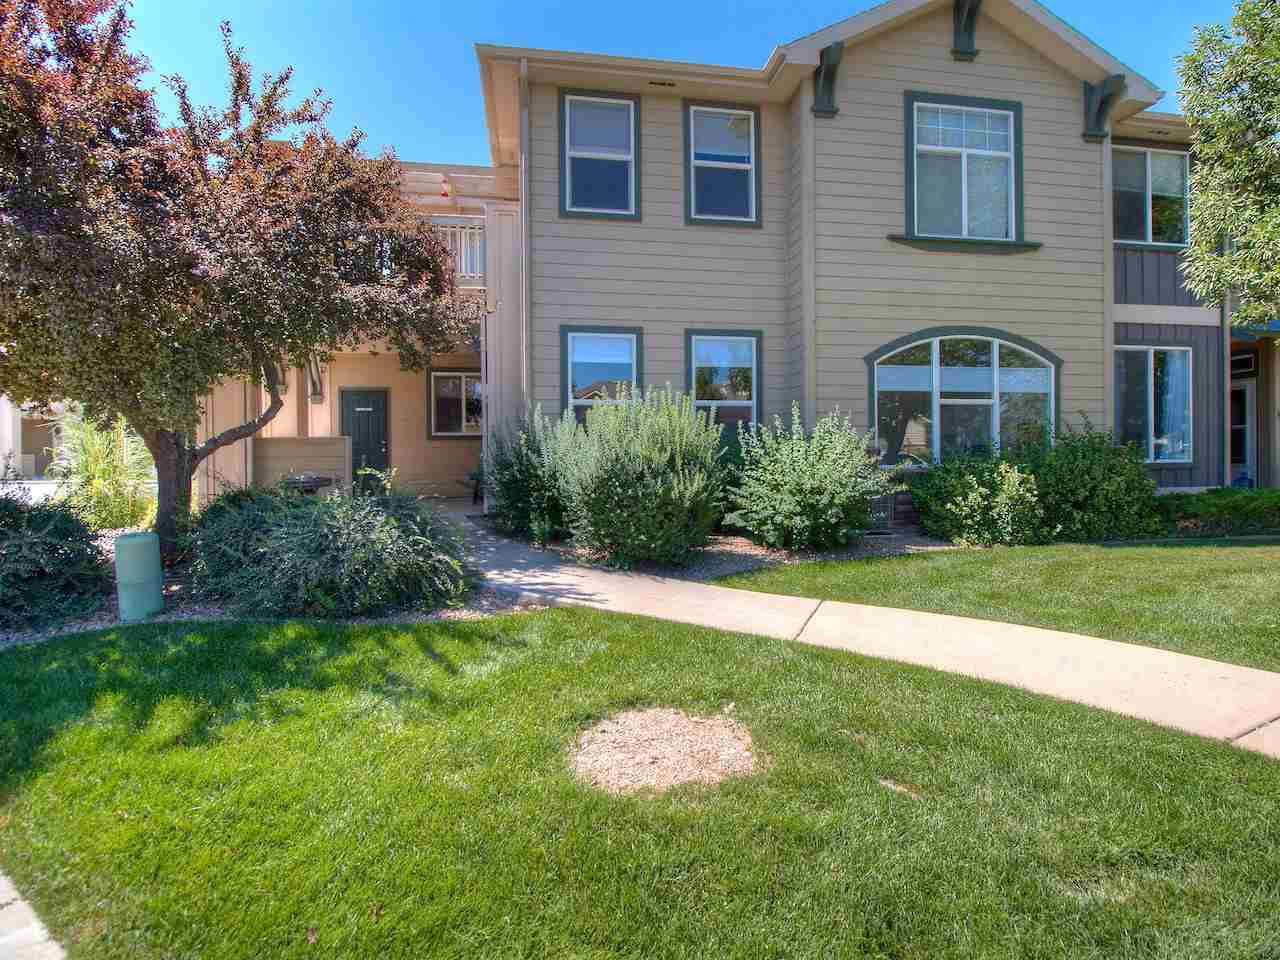 2485 Fountainhead Boulevard, Grand Junction, CO 81505